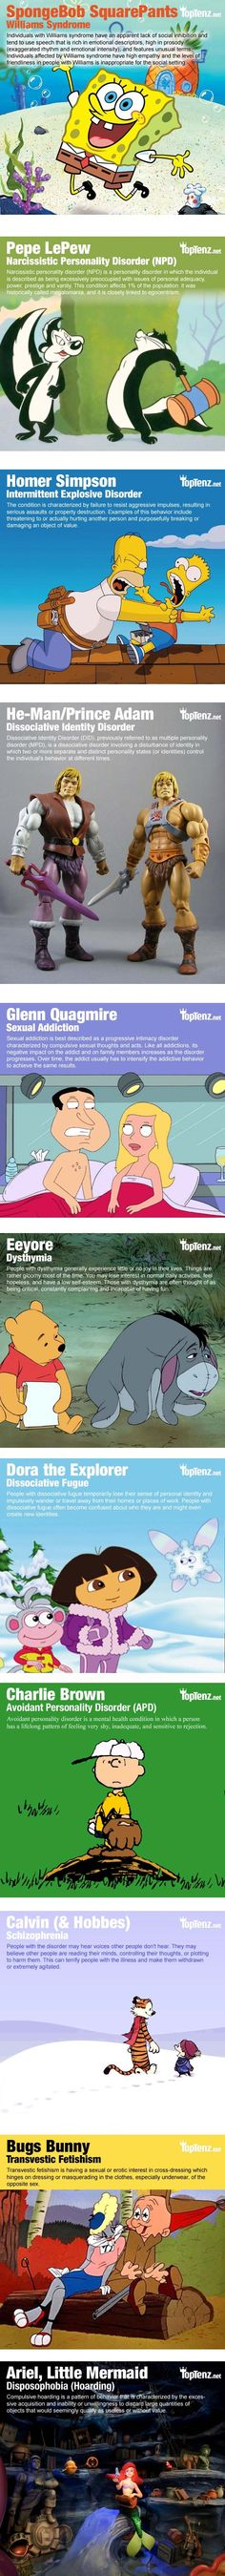 Cartoon Mental Disorders